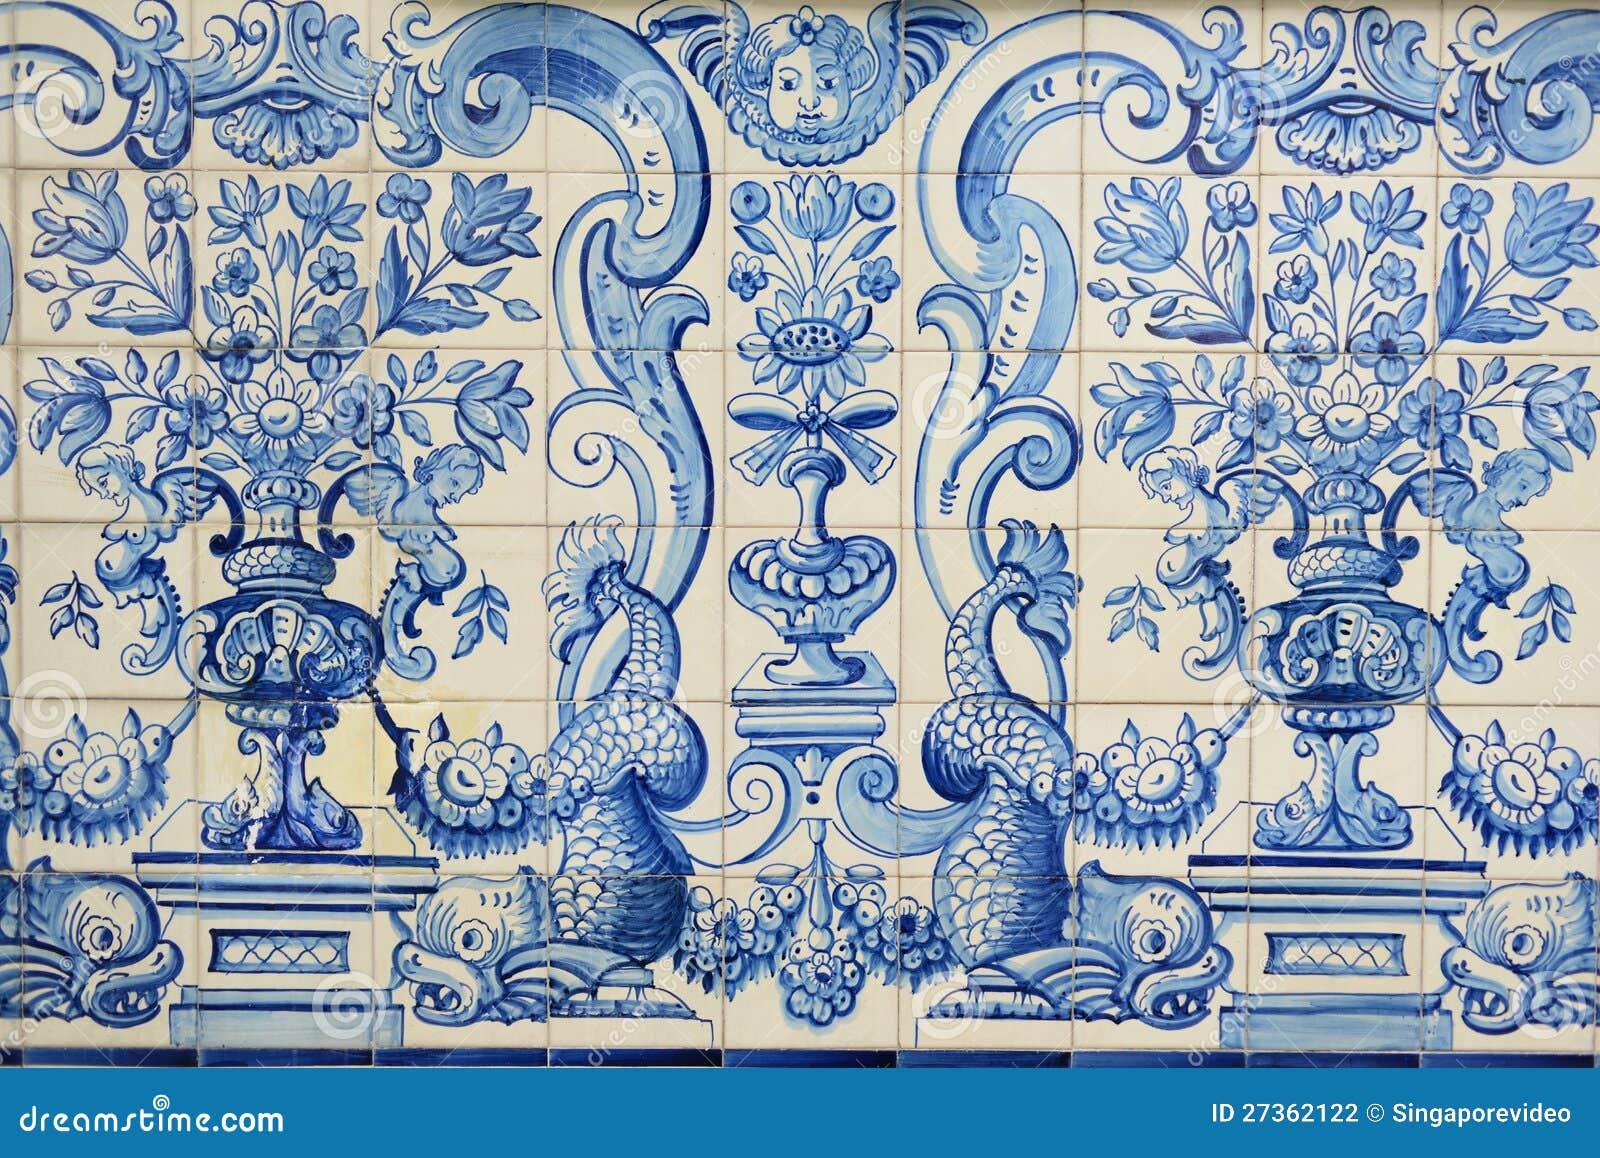 azulejos azules hist ricos de china oriental asia foto de